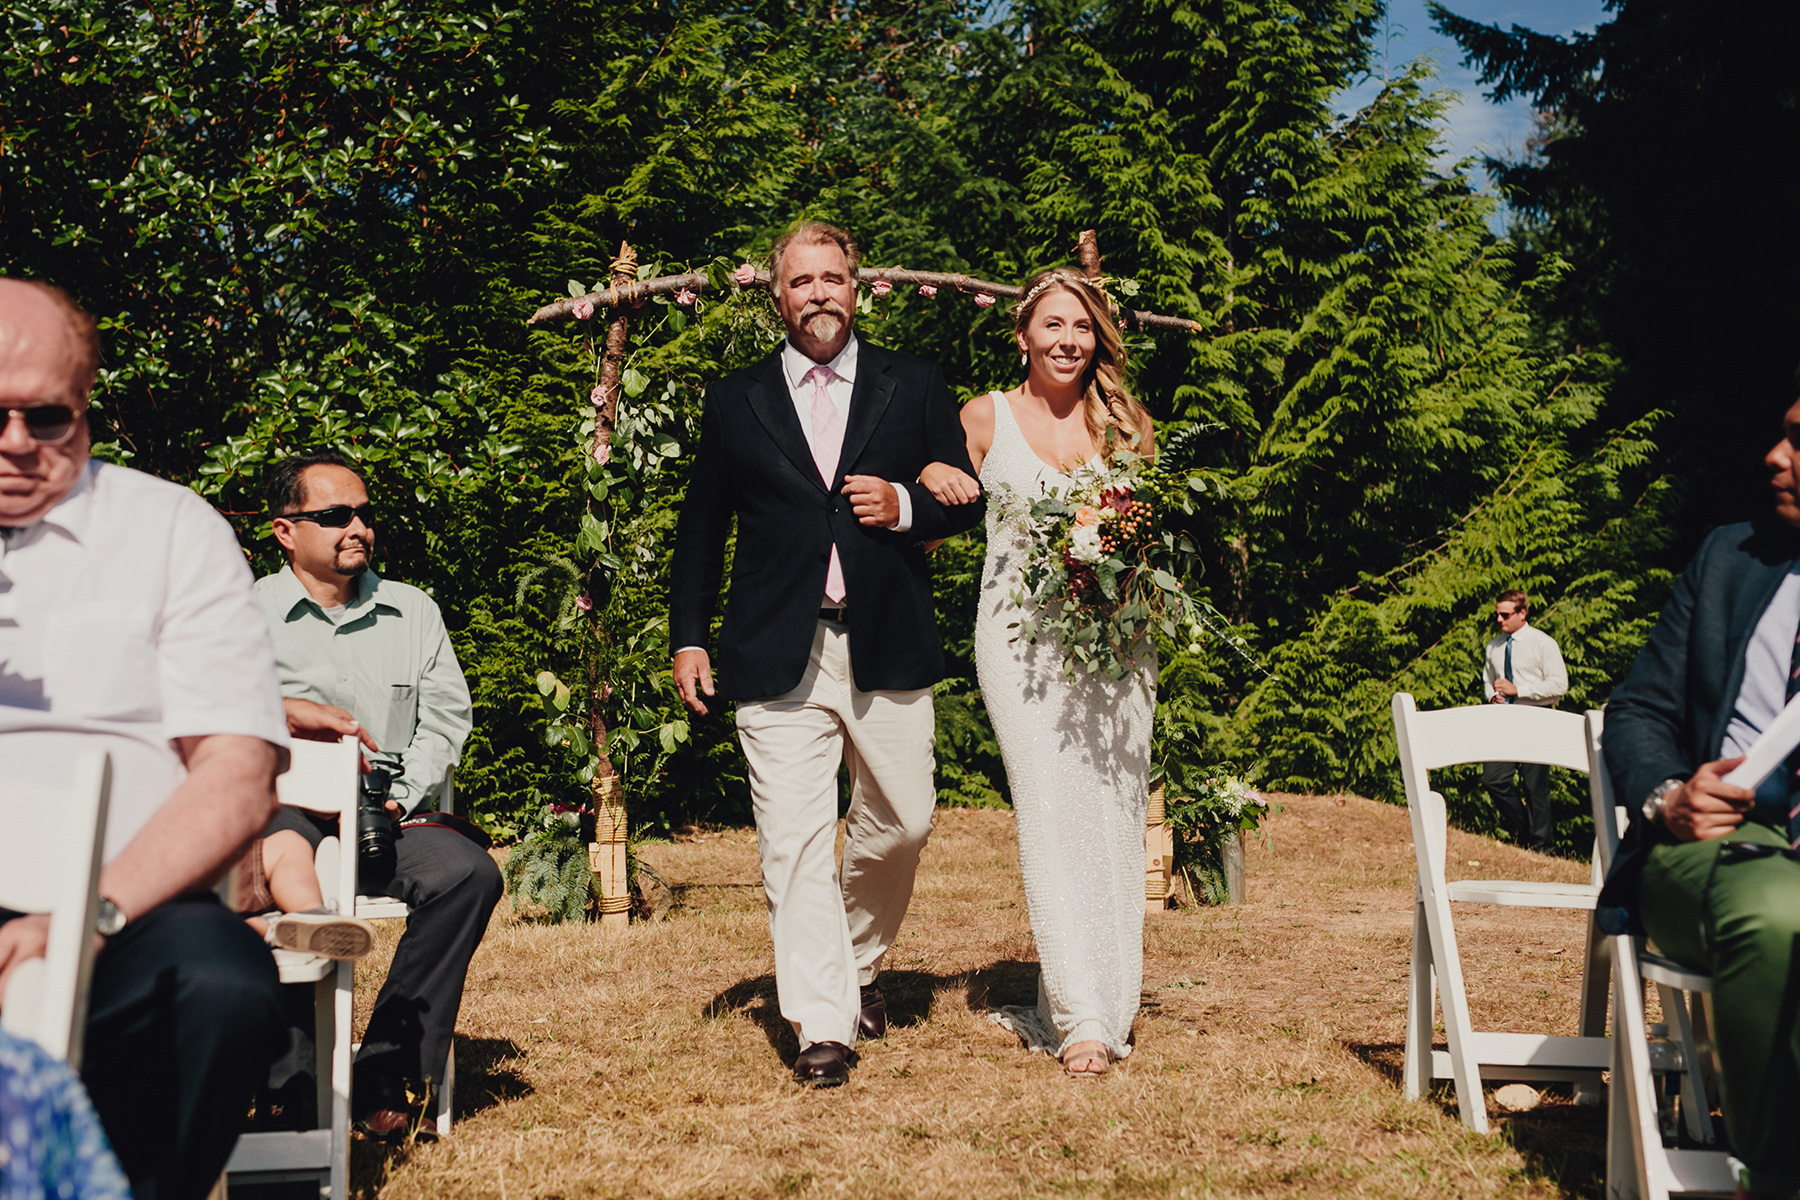 galiano-island-bodega-destination-wedding-0050.JPG